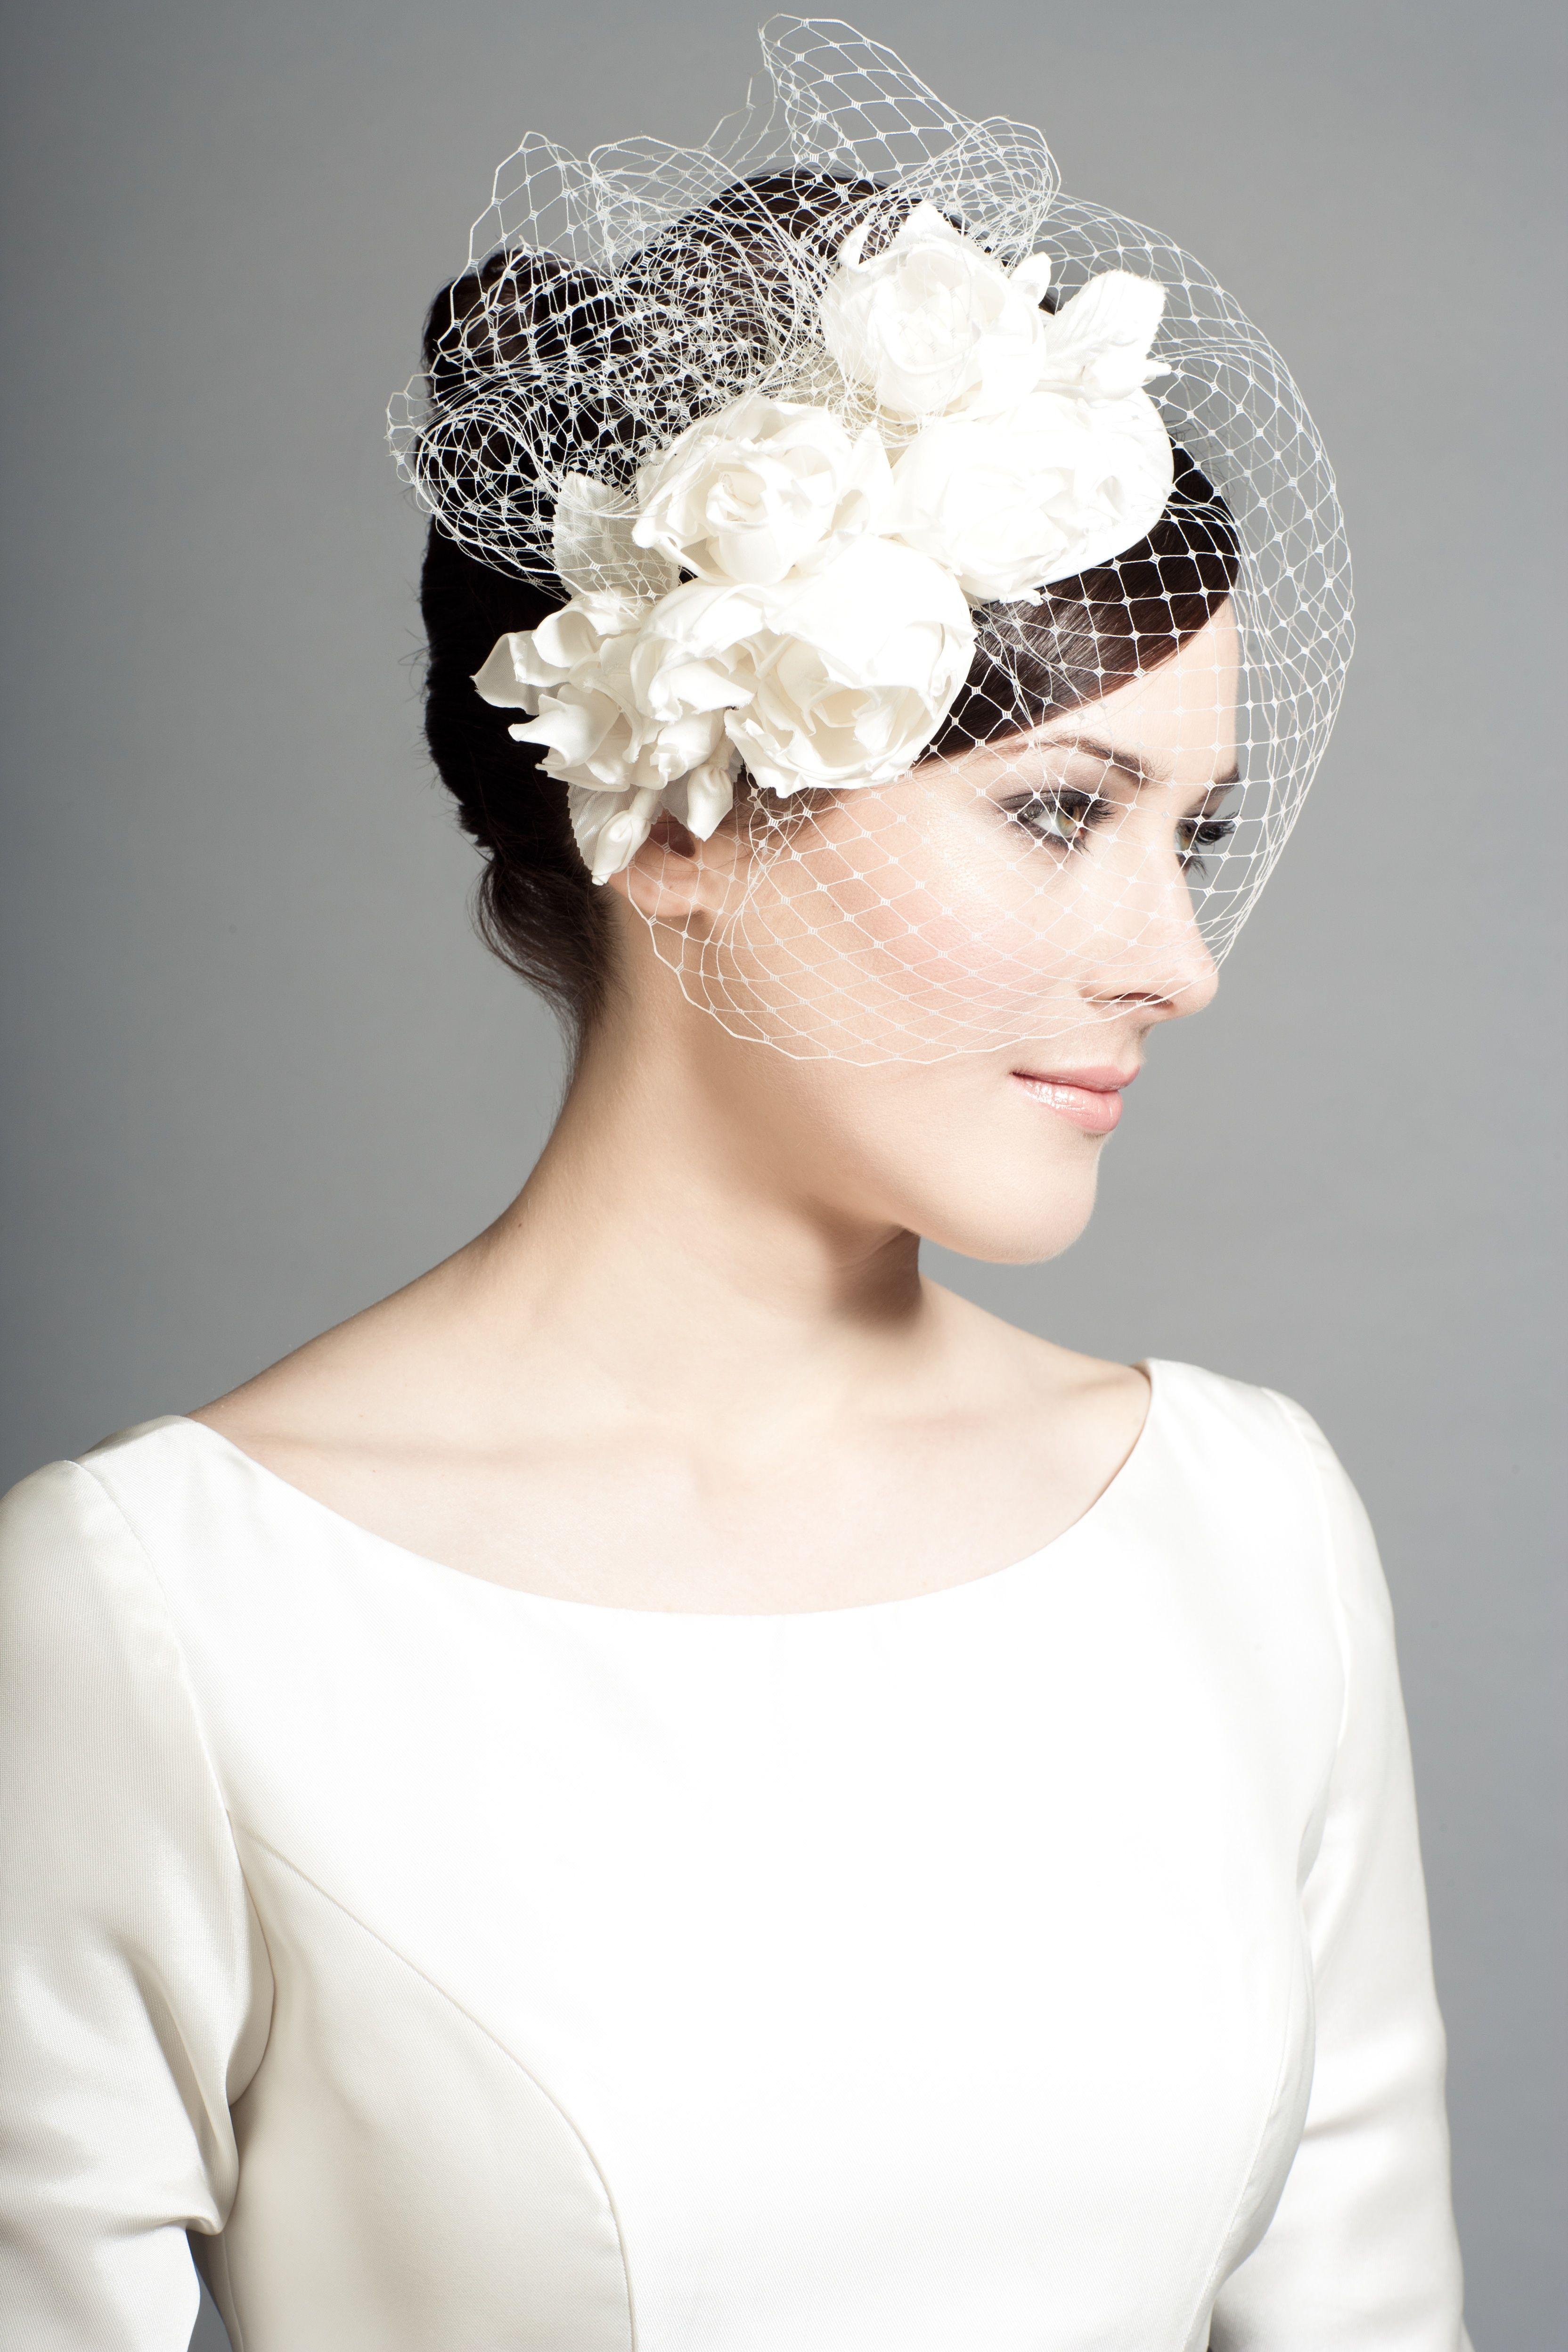 d59badff248be Rachel Trevor Morgan Millinery - Bridal R1503 Silk teardrop with silk  taffeta roses and face veil